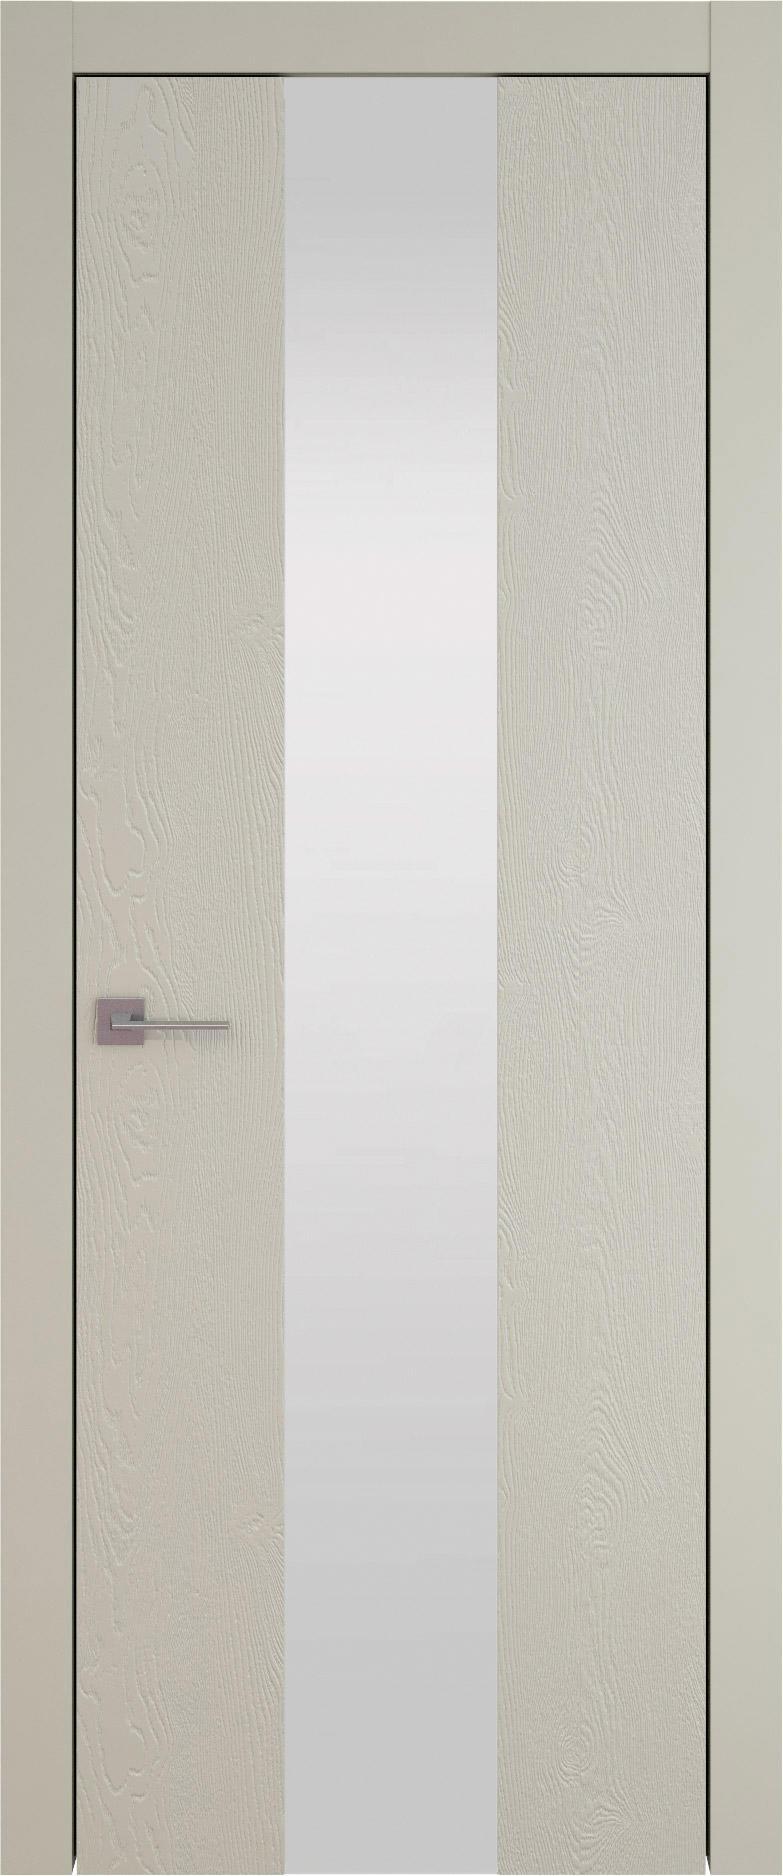 Tivoli Ж-1 цвет - Серо-оливковая эмаль по шпону (RAL 7032) Со стеклом (ДО)